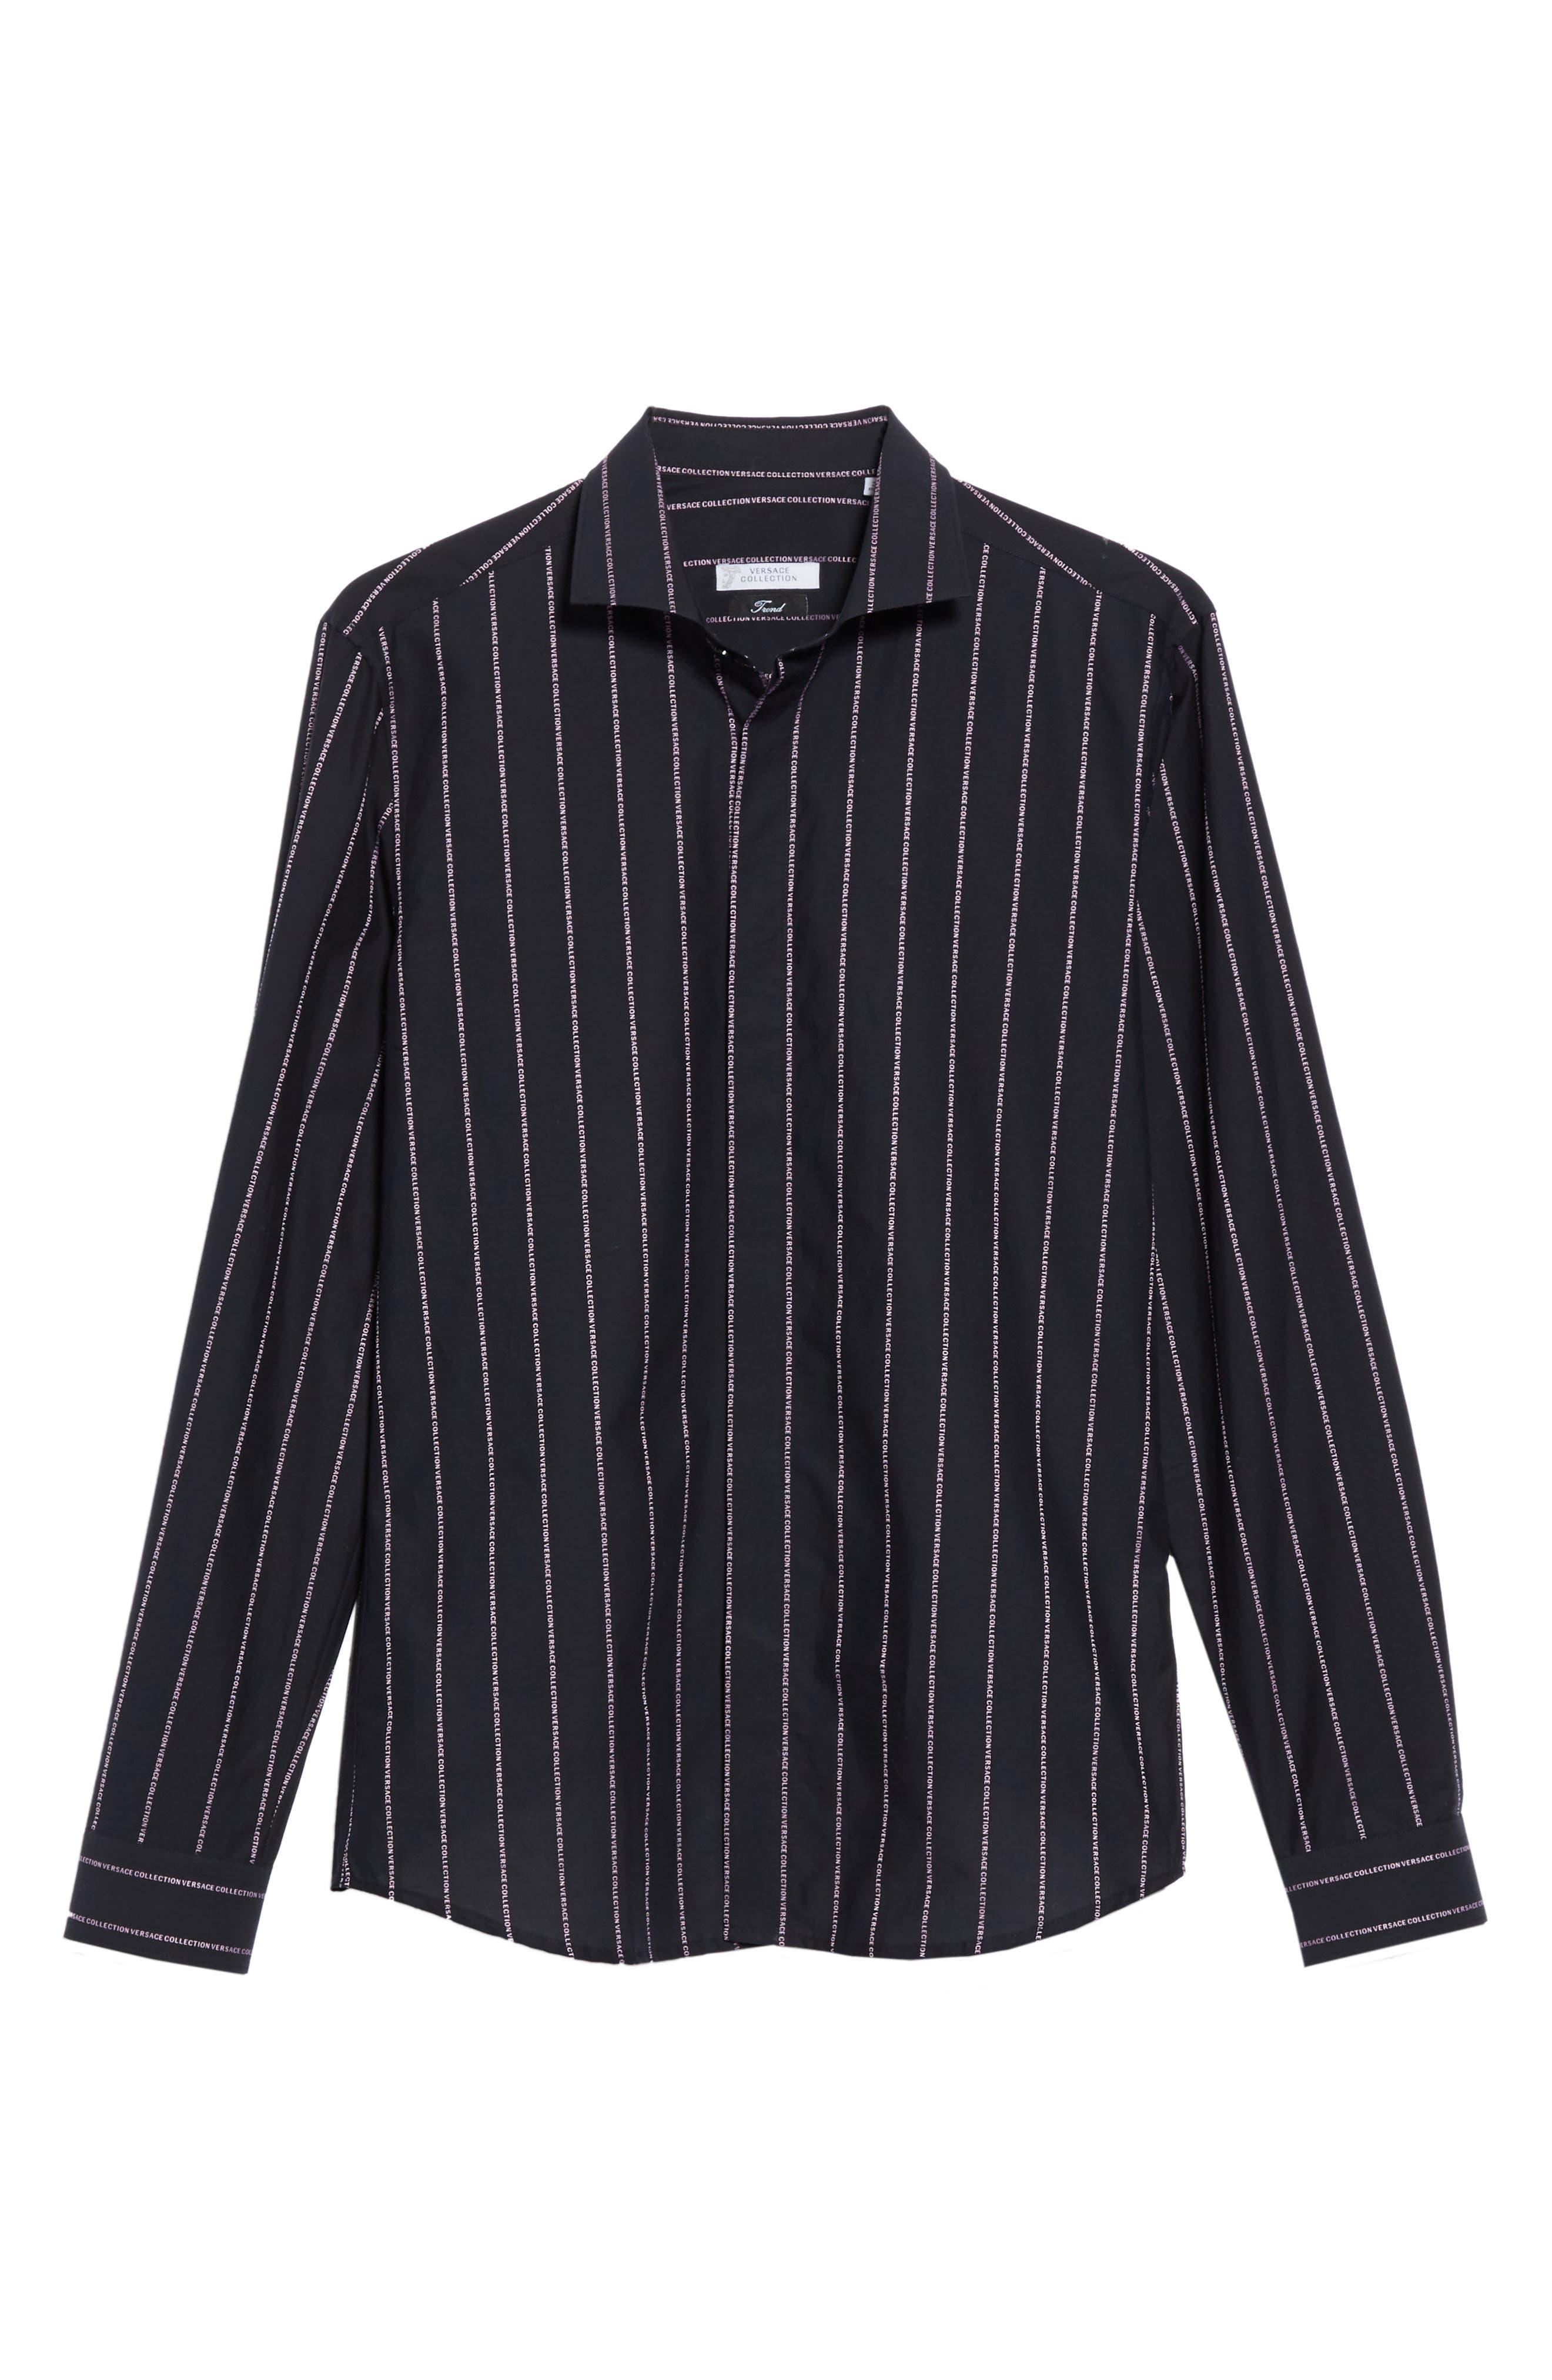 VERSACE COLLECTION, Logo Stripe Sport Shirt, Alternate thumbnail 5, color, BLACK/ PINK